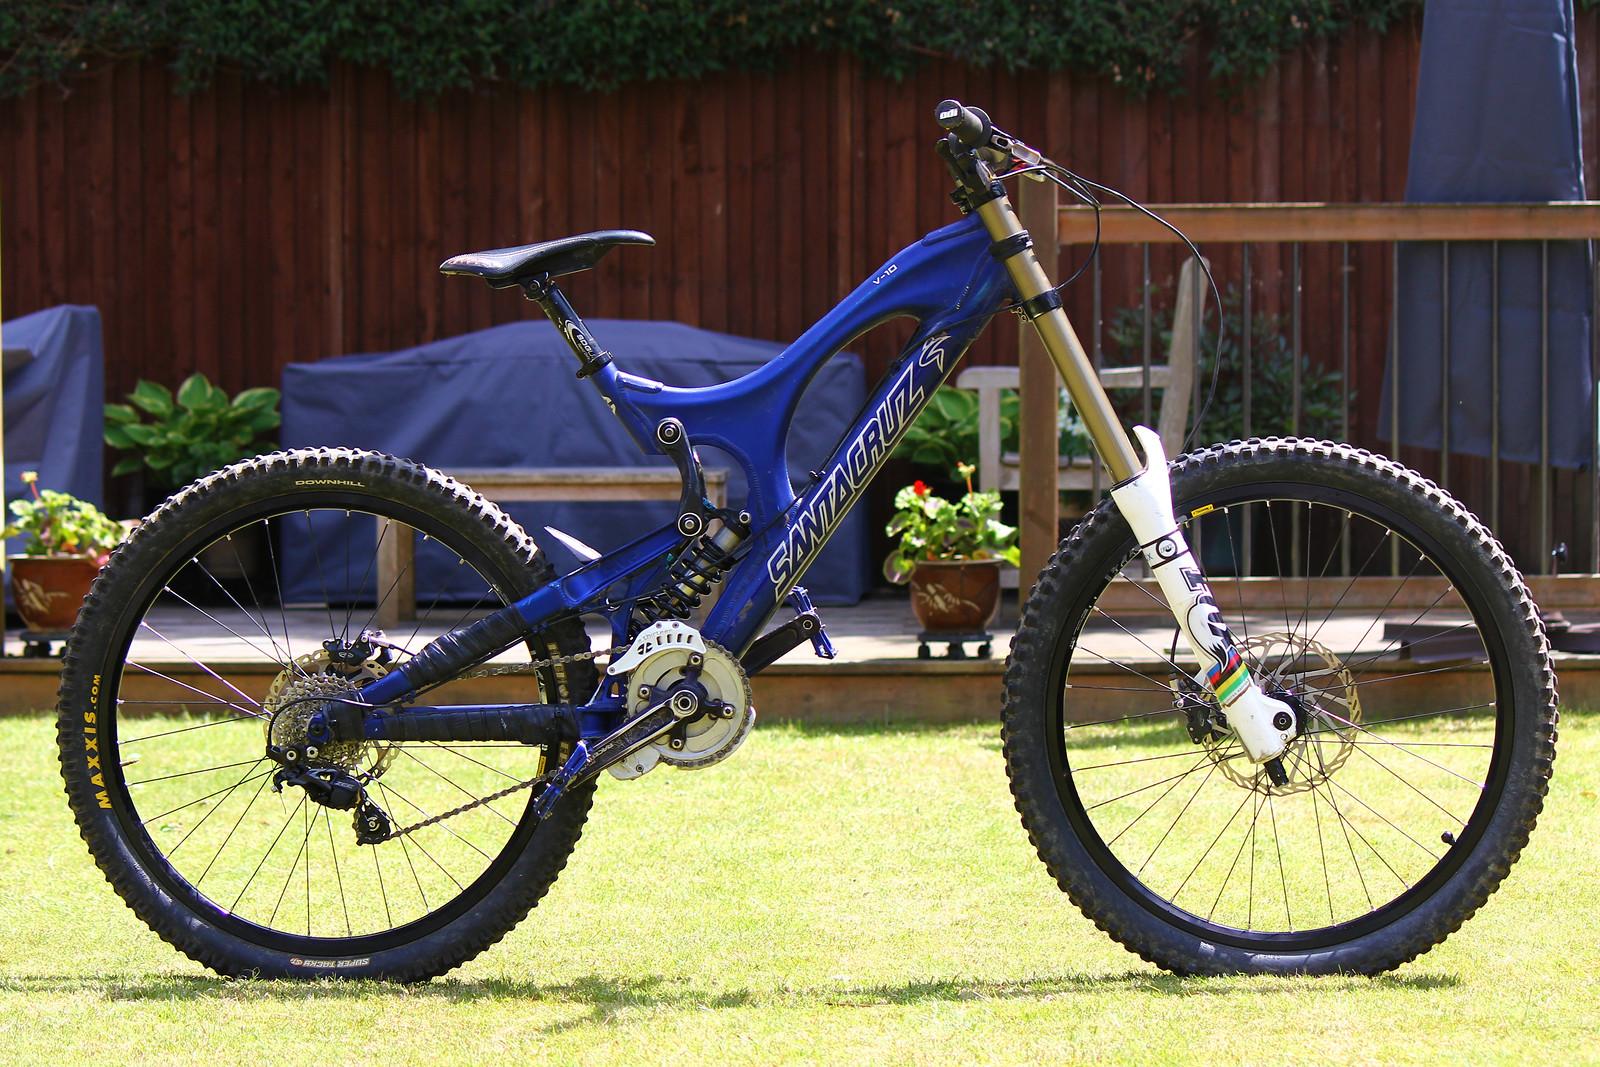 Santa Cruz v10 - David_Hill - Mountain Biking Pictures - Vital MTB